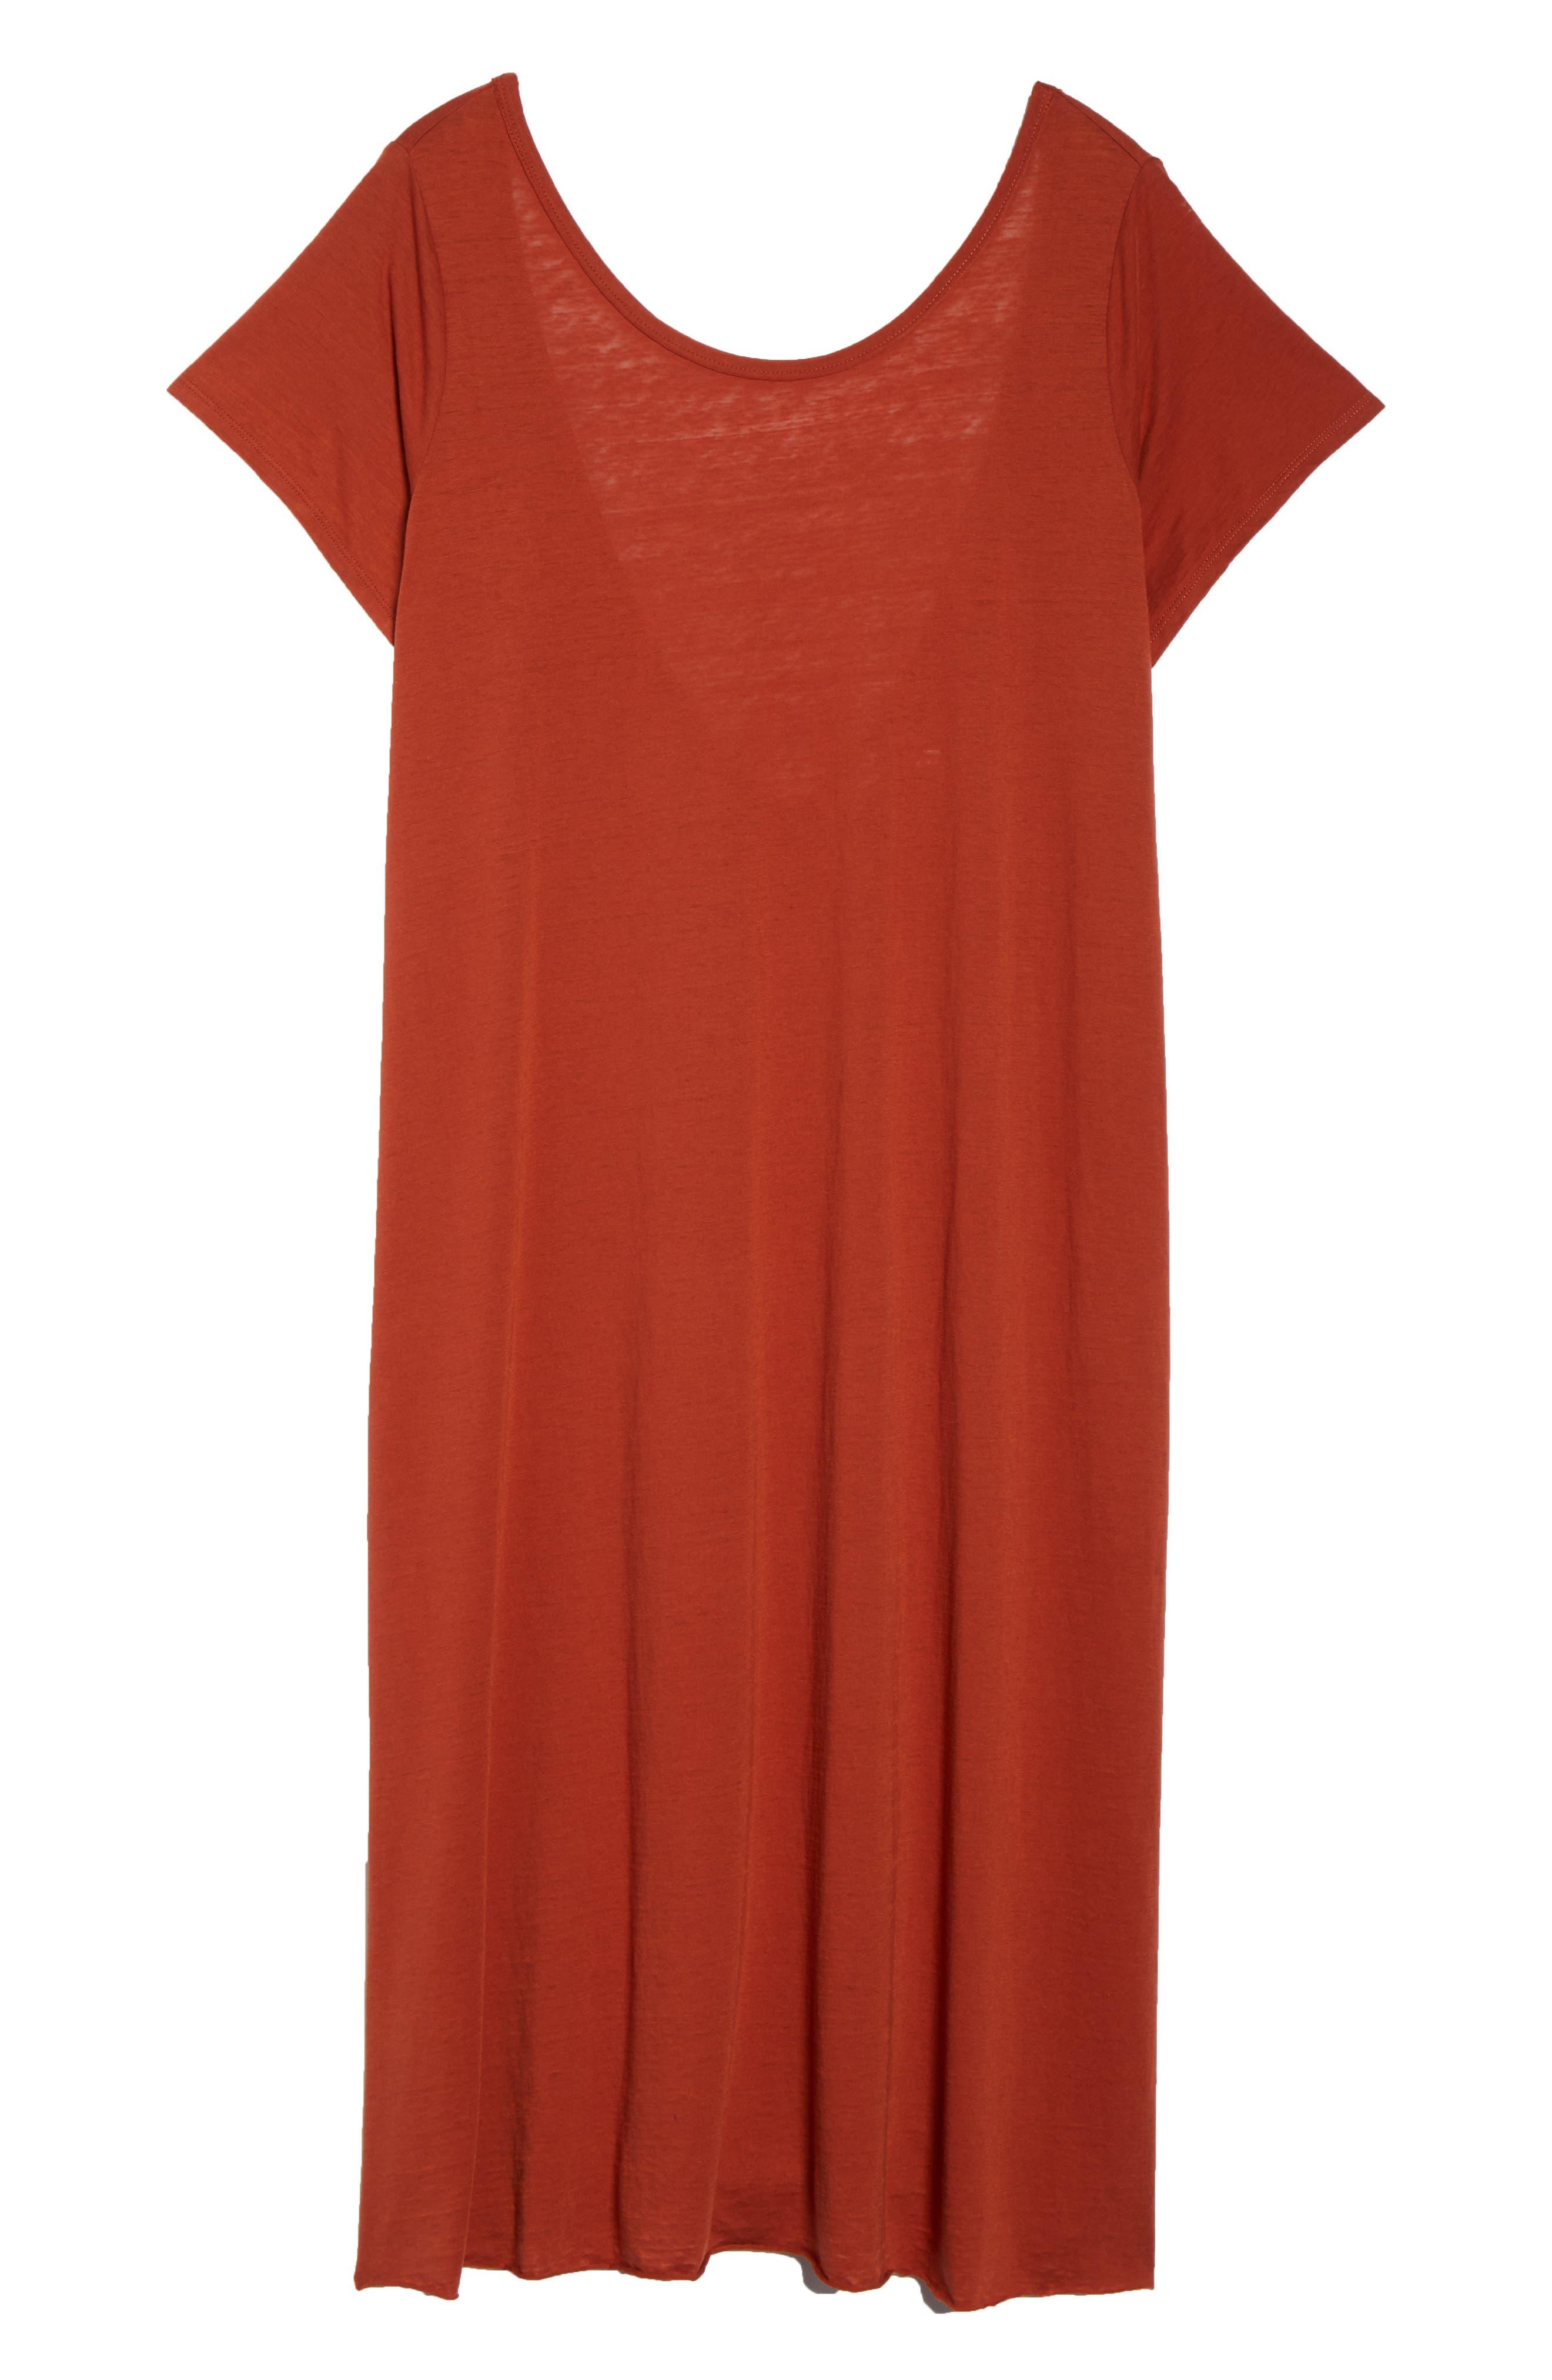 Easy Burnout Cover-Up T-Shirt Dress,                             Alternate thumbnail 6, color,                             221